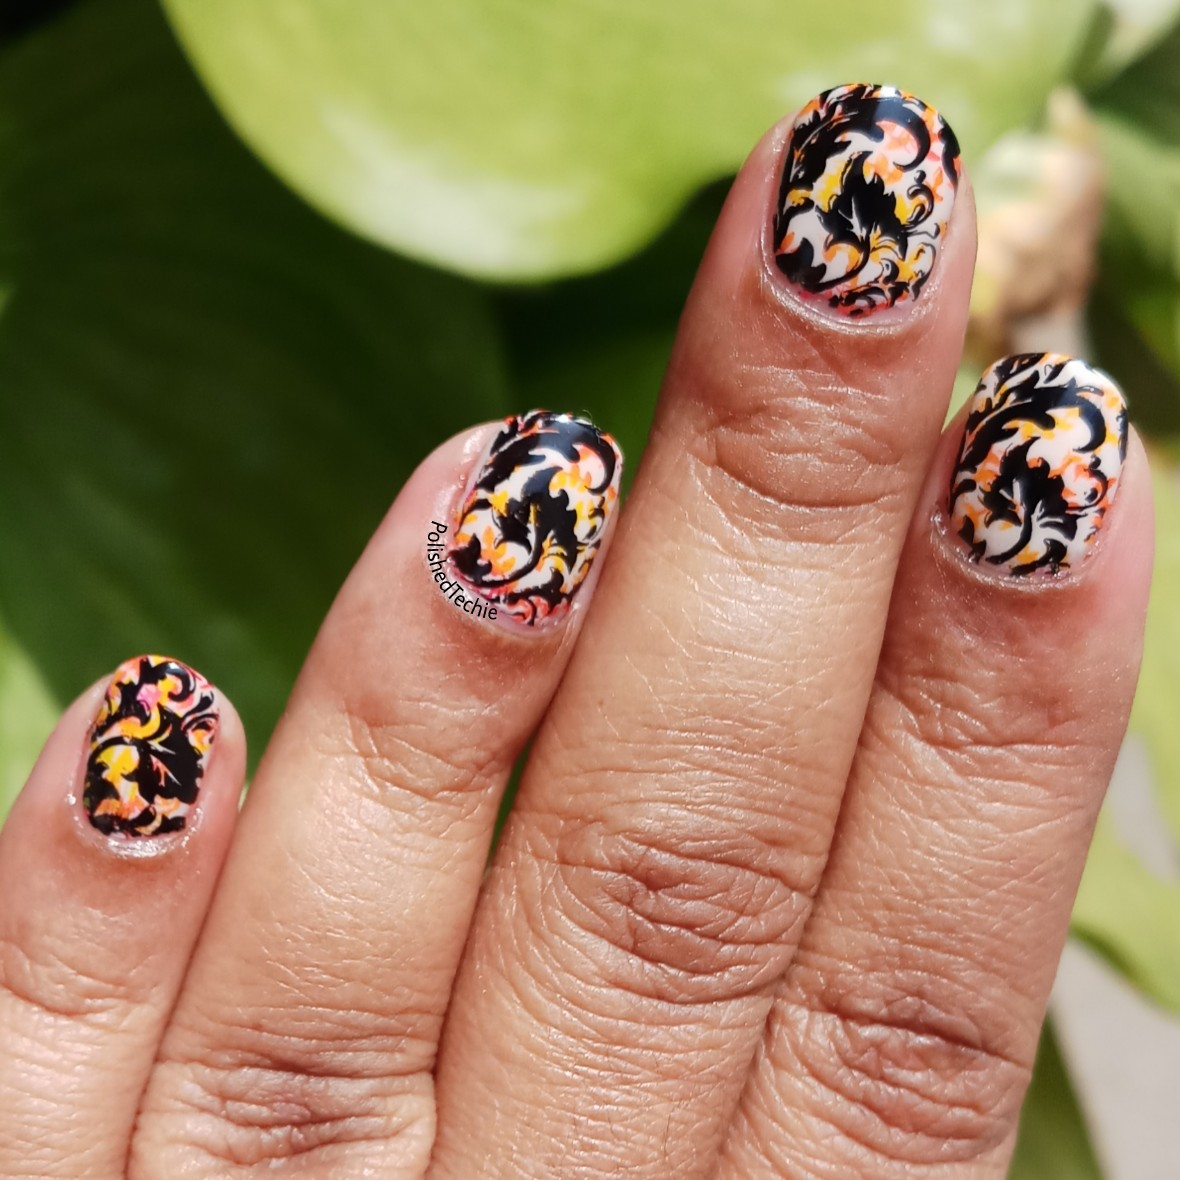 Polished Techie | Indian Nail Art Blog on Feedspot - Rss Feed